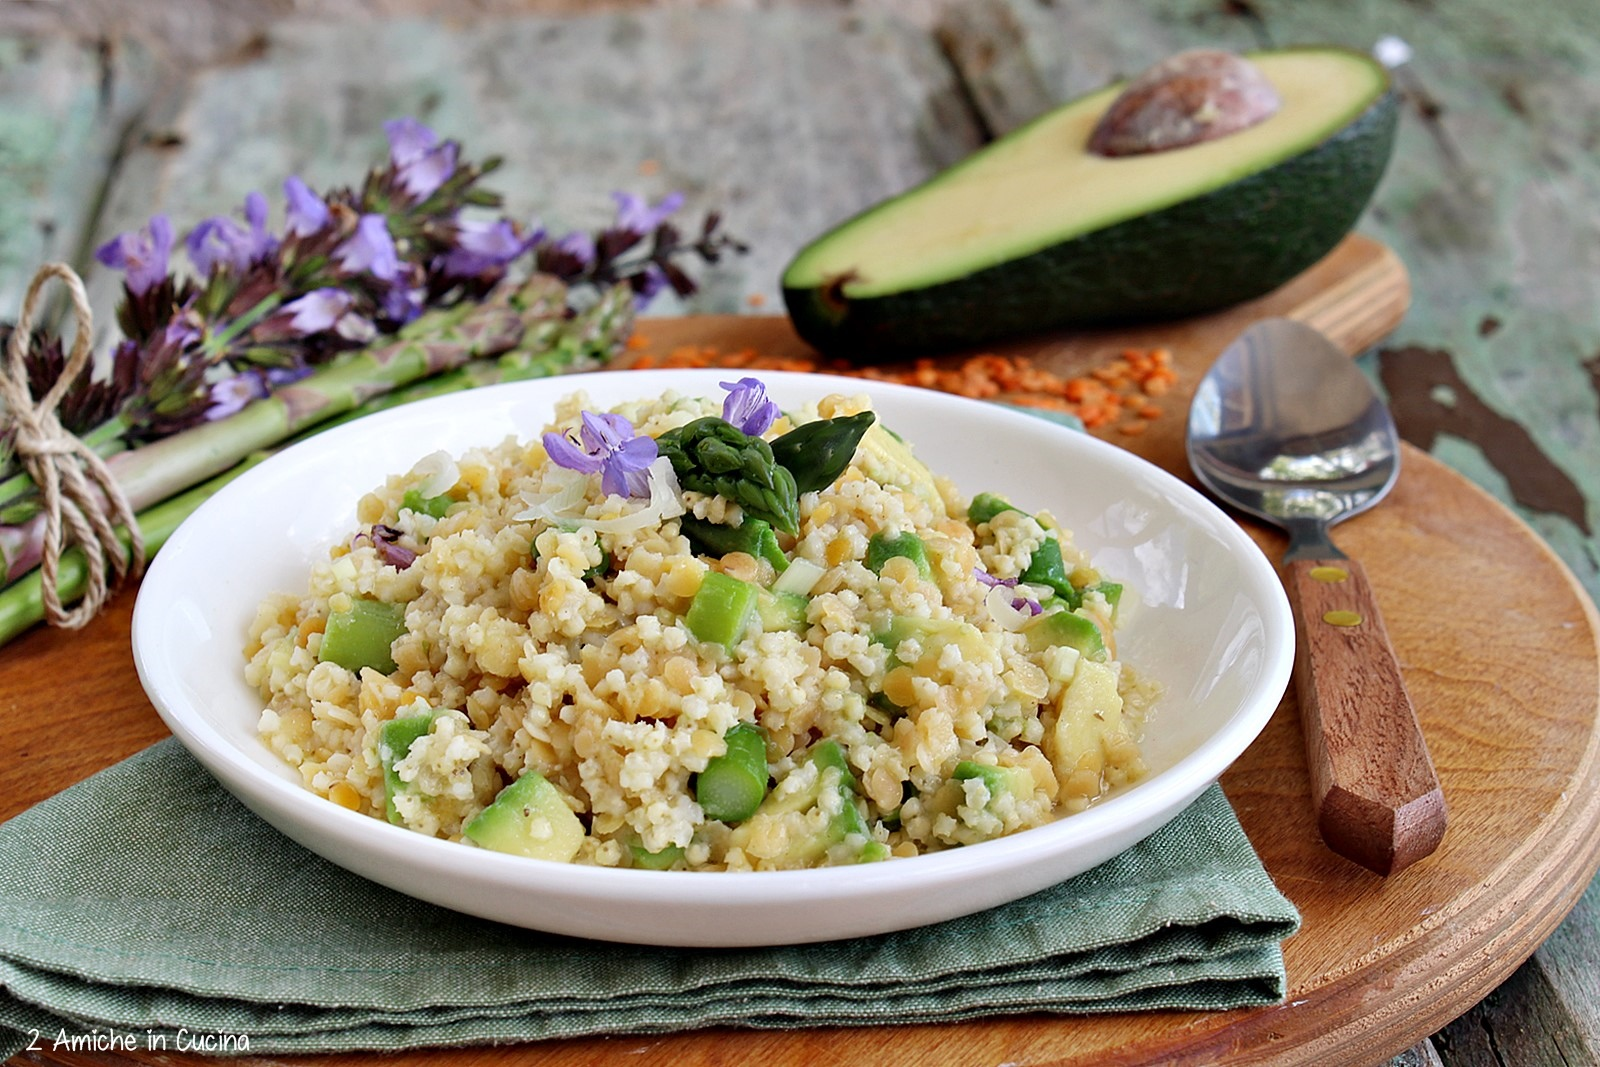 Primo piatto vegan con verdure e avocado